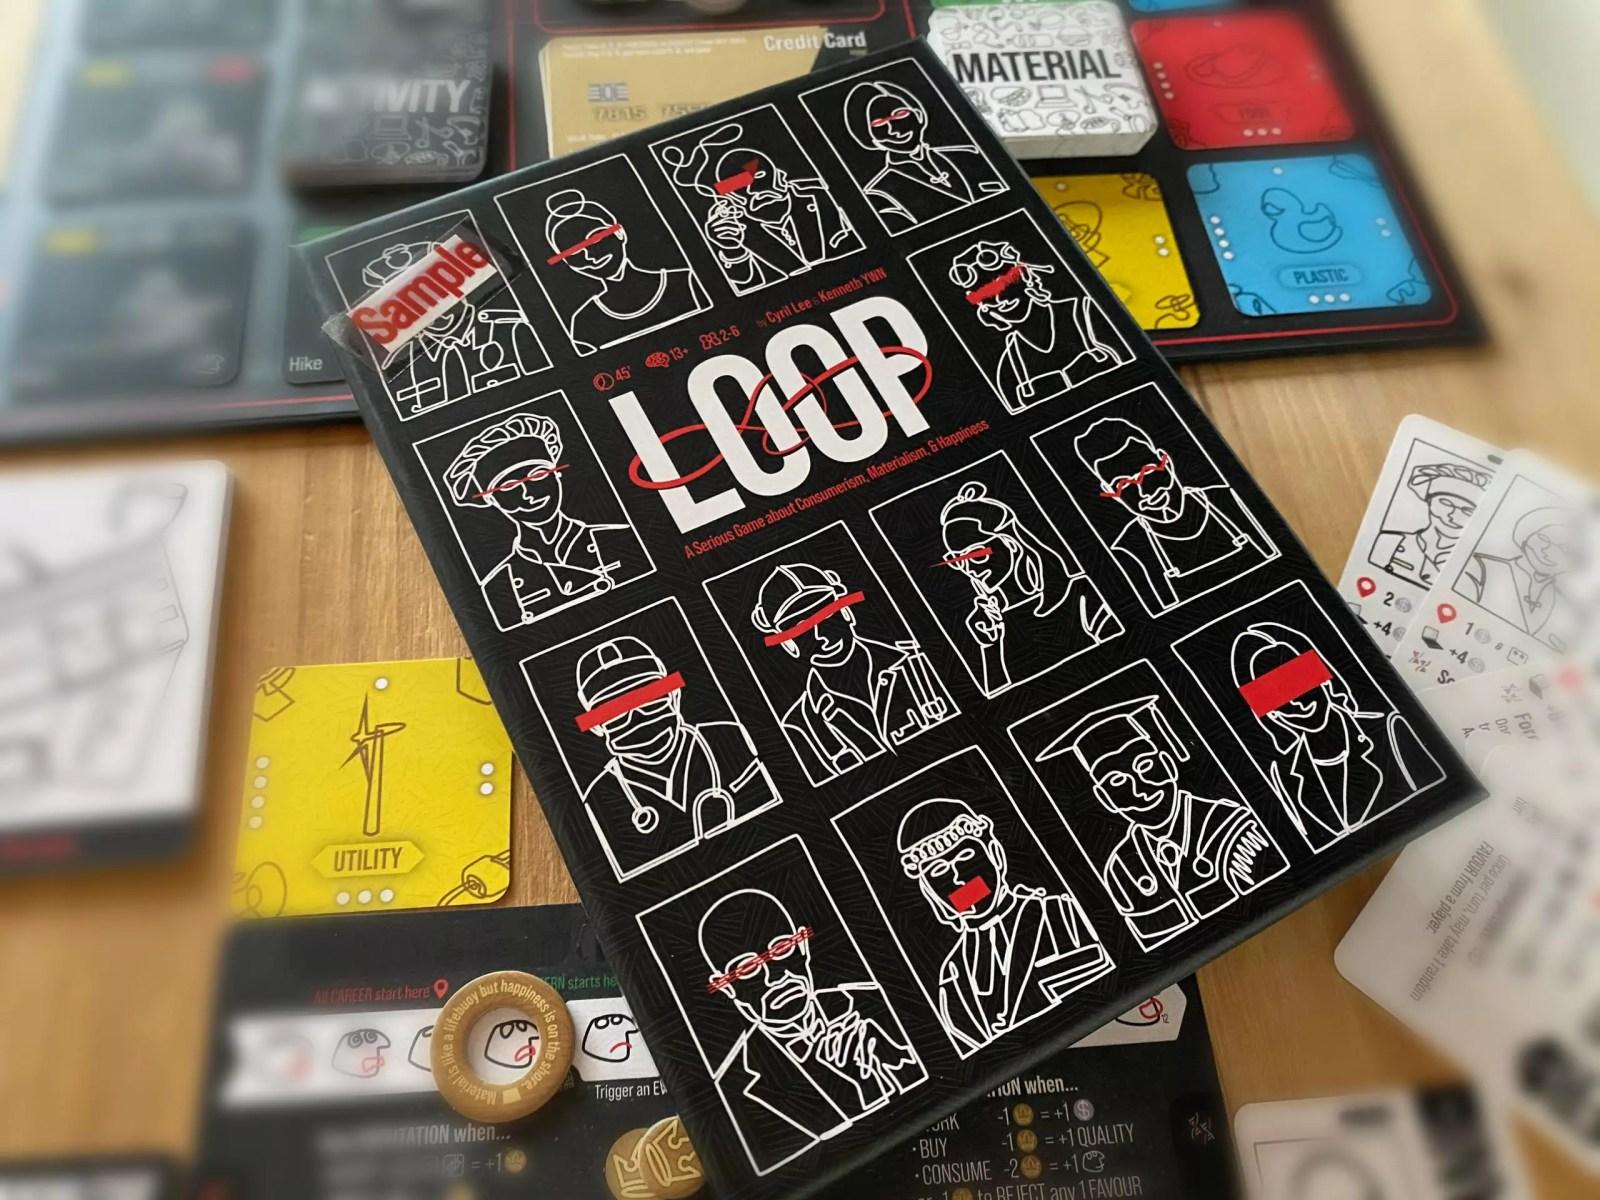 loop life ordinary people